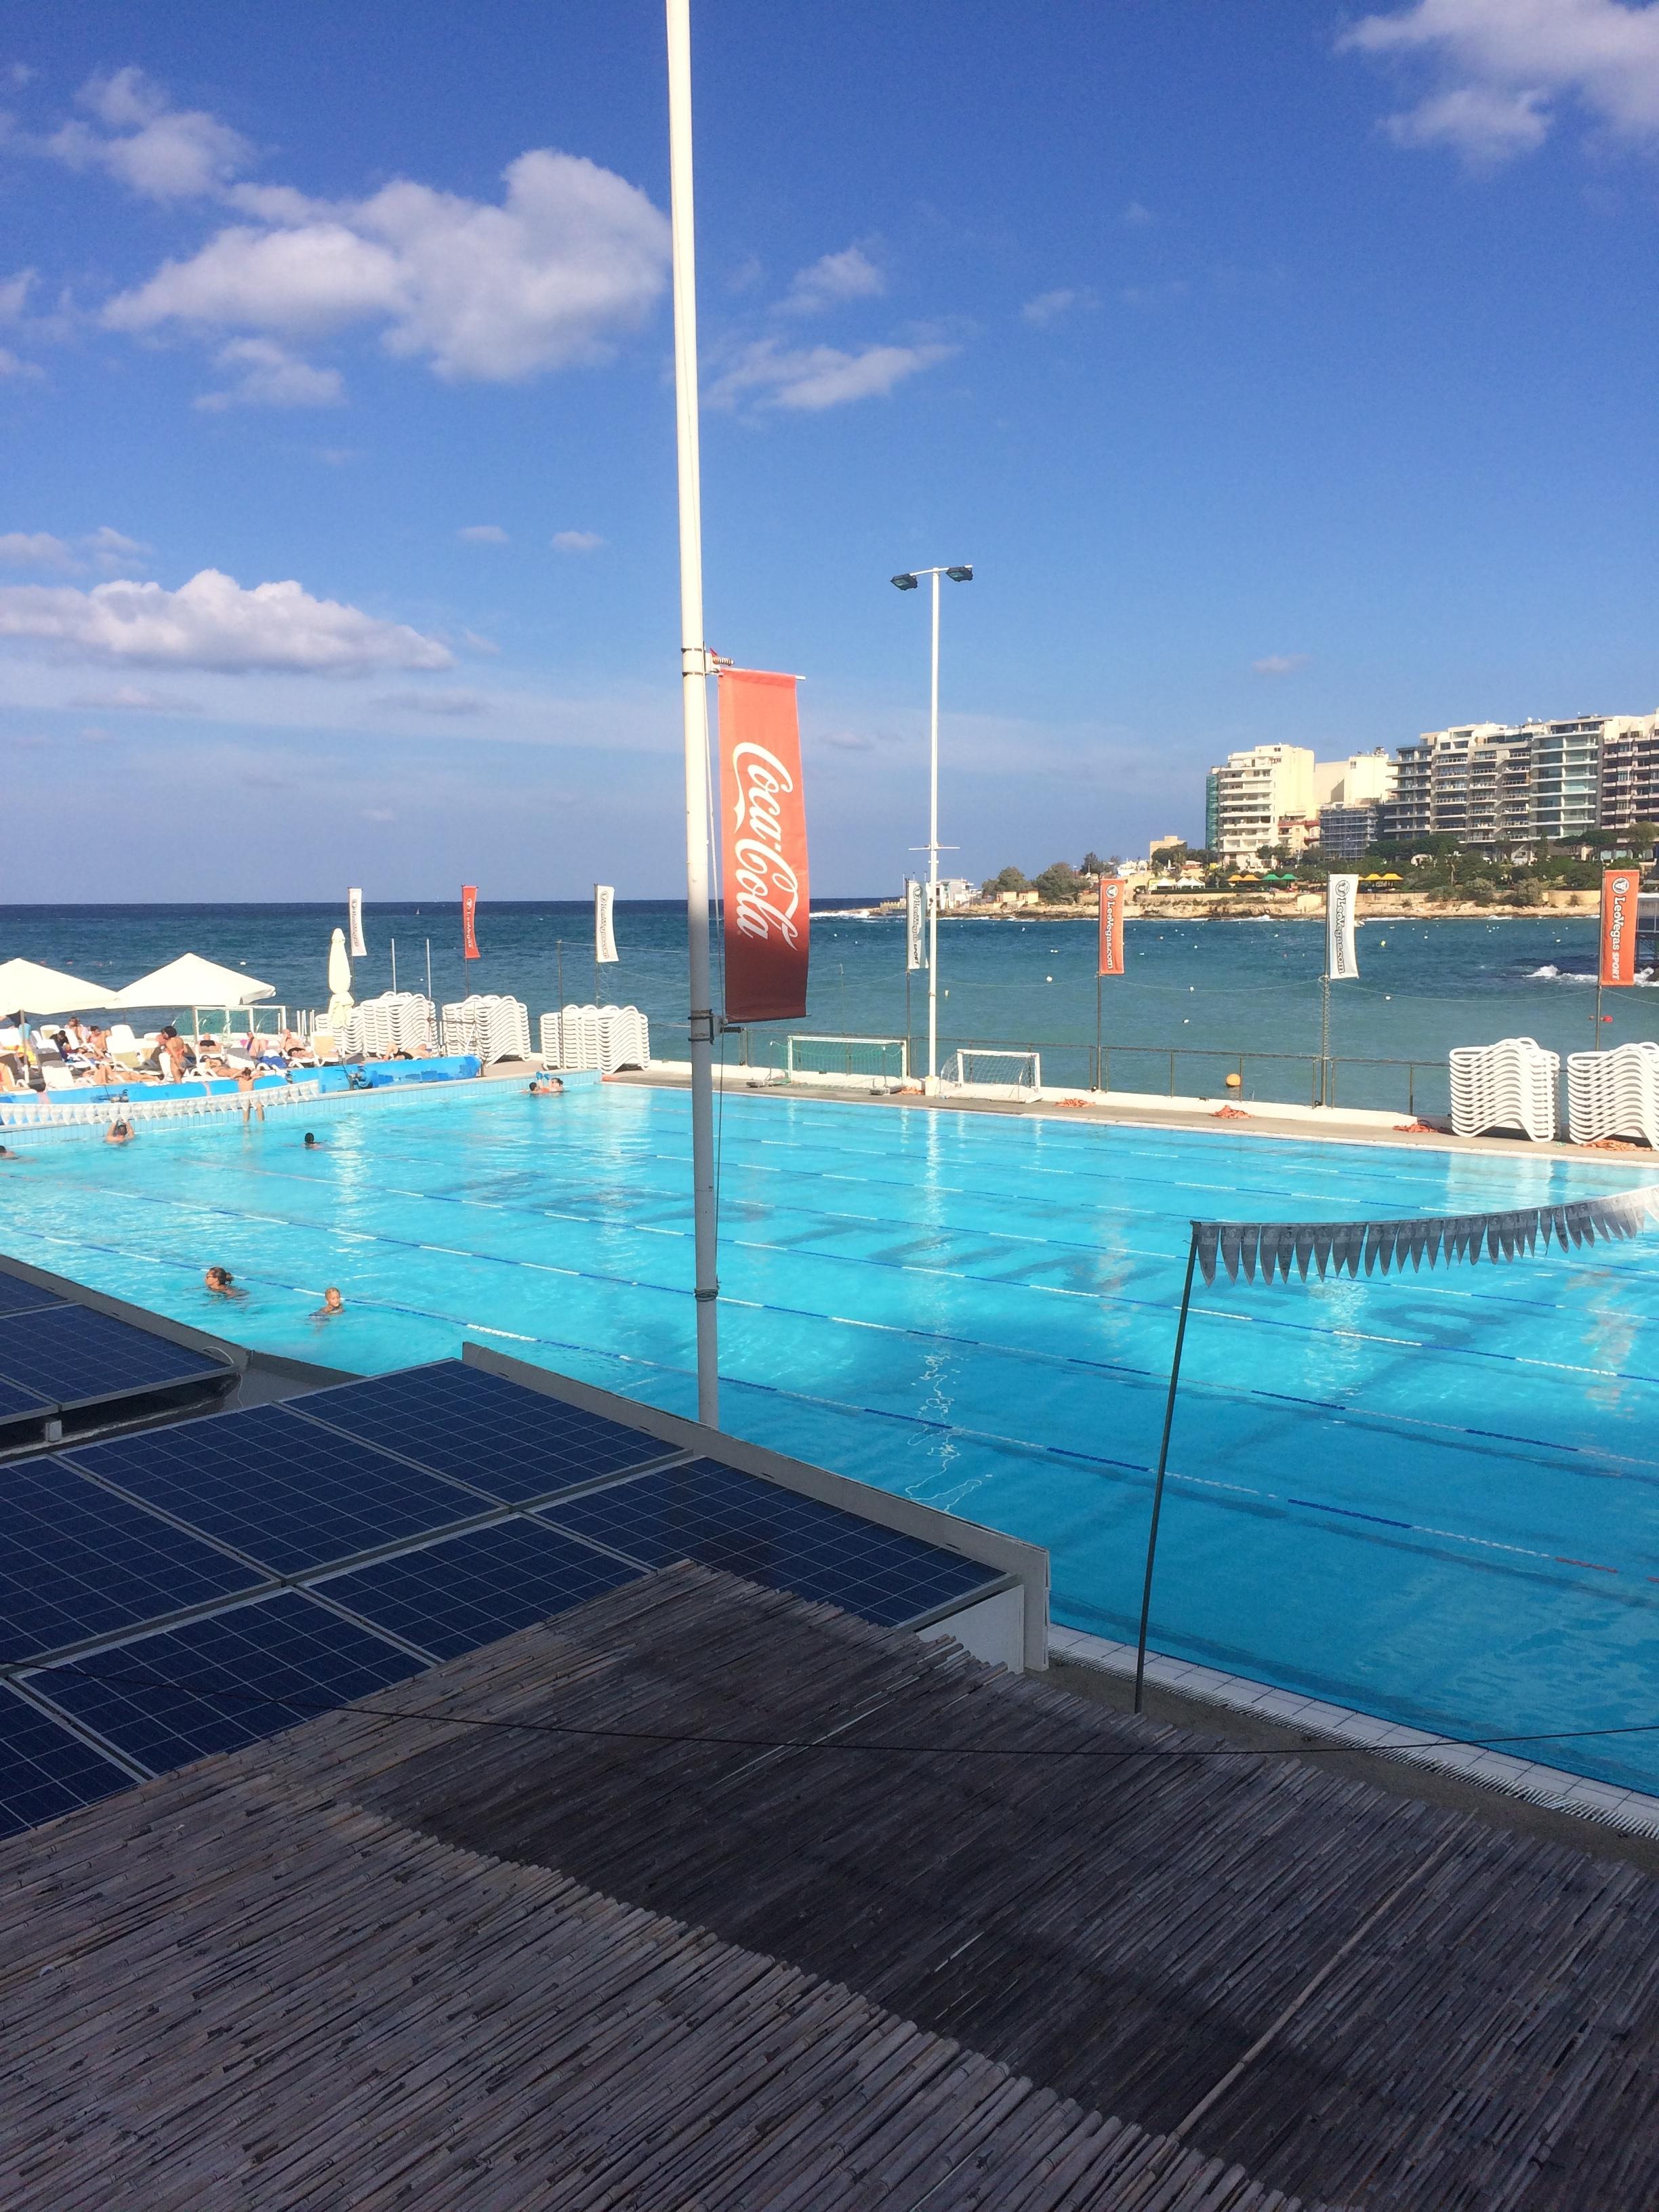 Seaside swimming in Malta!